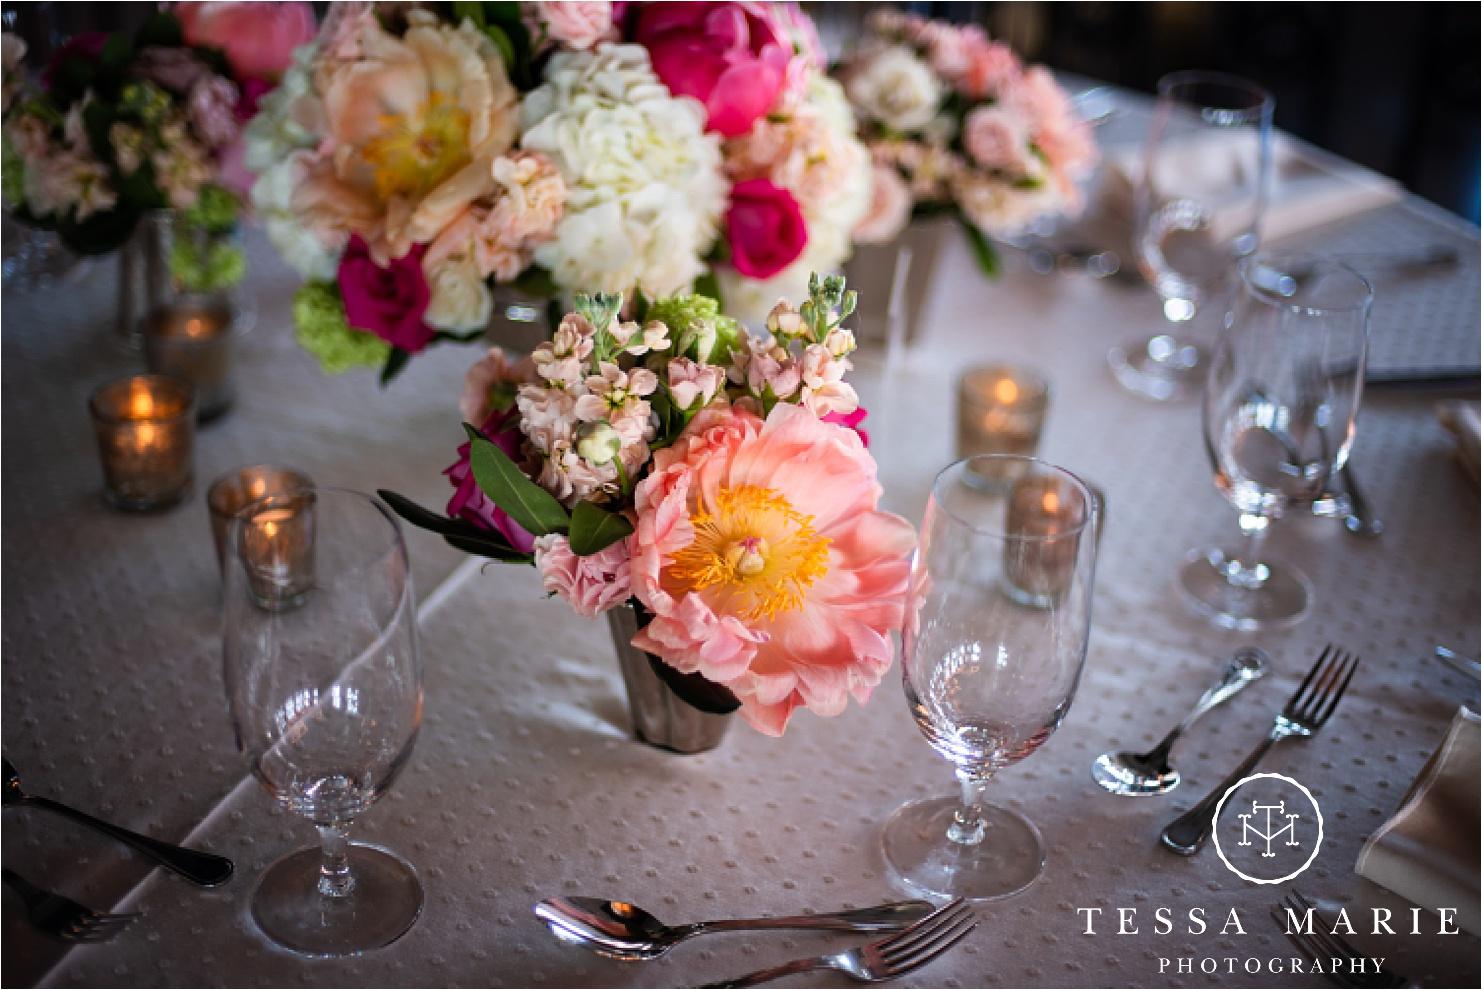 Tessa_marie_weddings_houston_wedding_photographer_The_astorian_0130.jpg